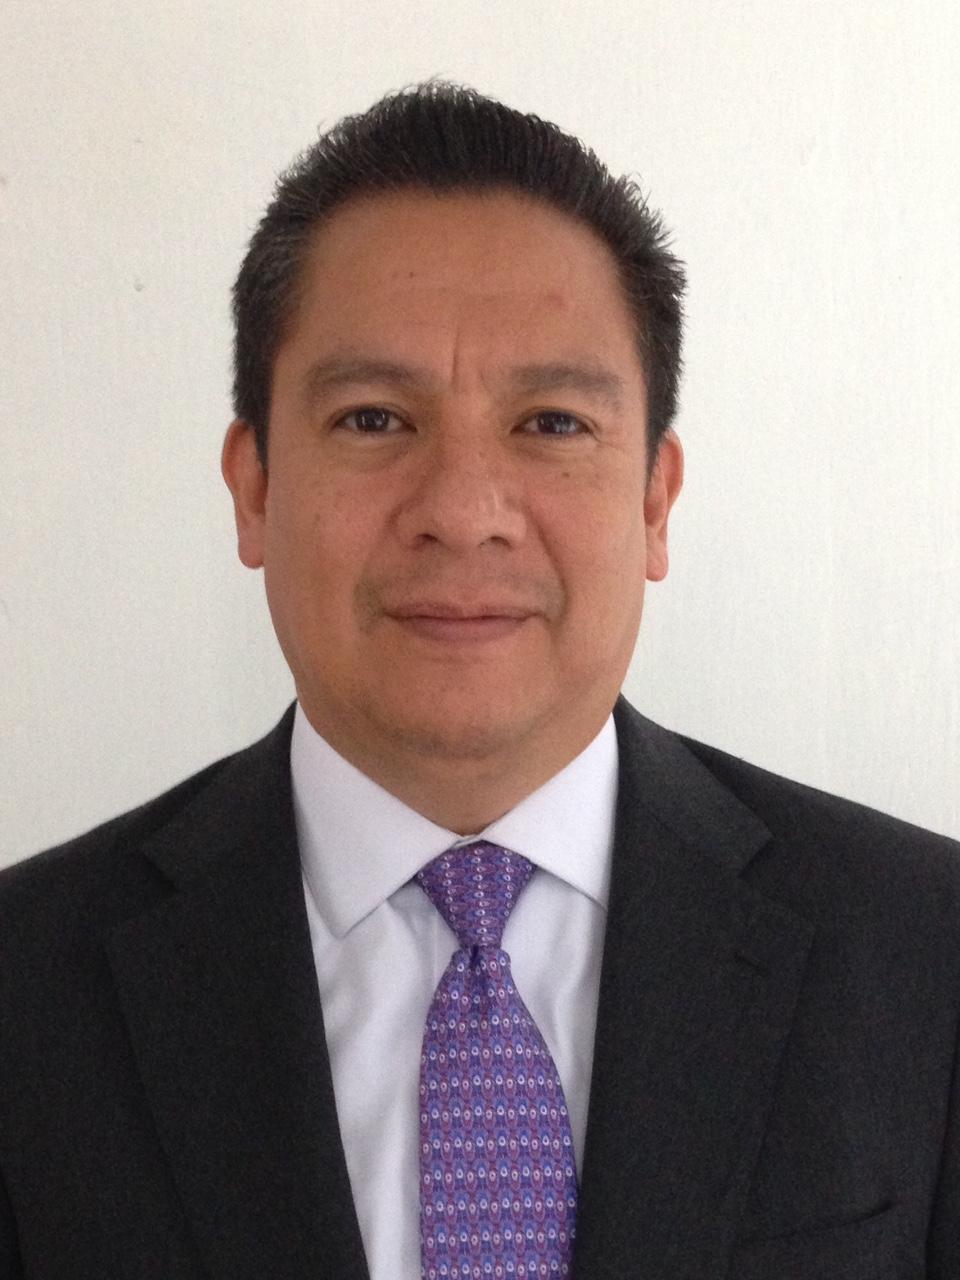 José Gabriel Carreño Camacho